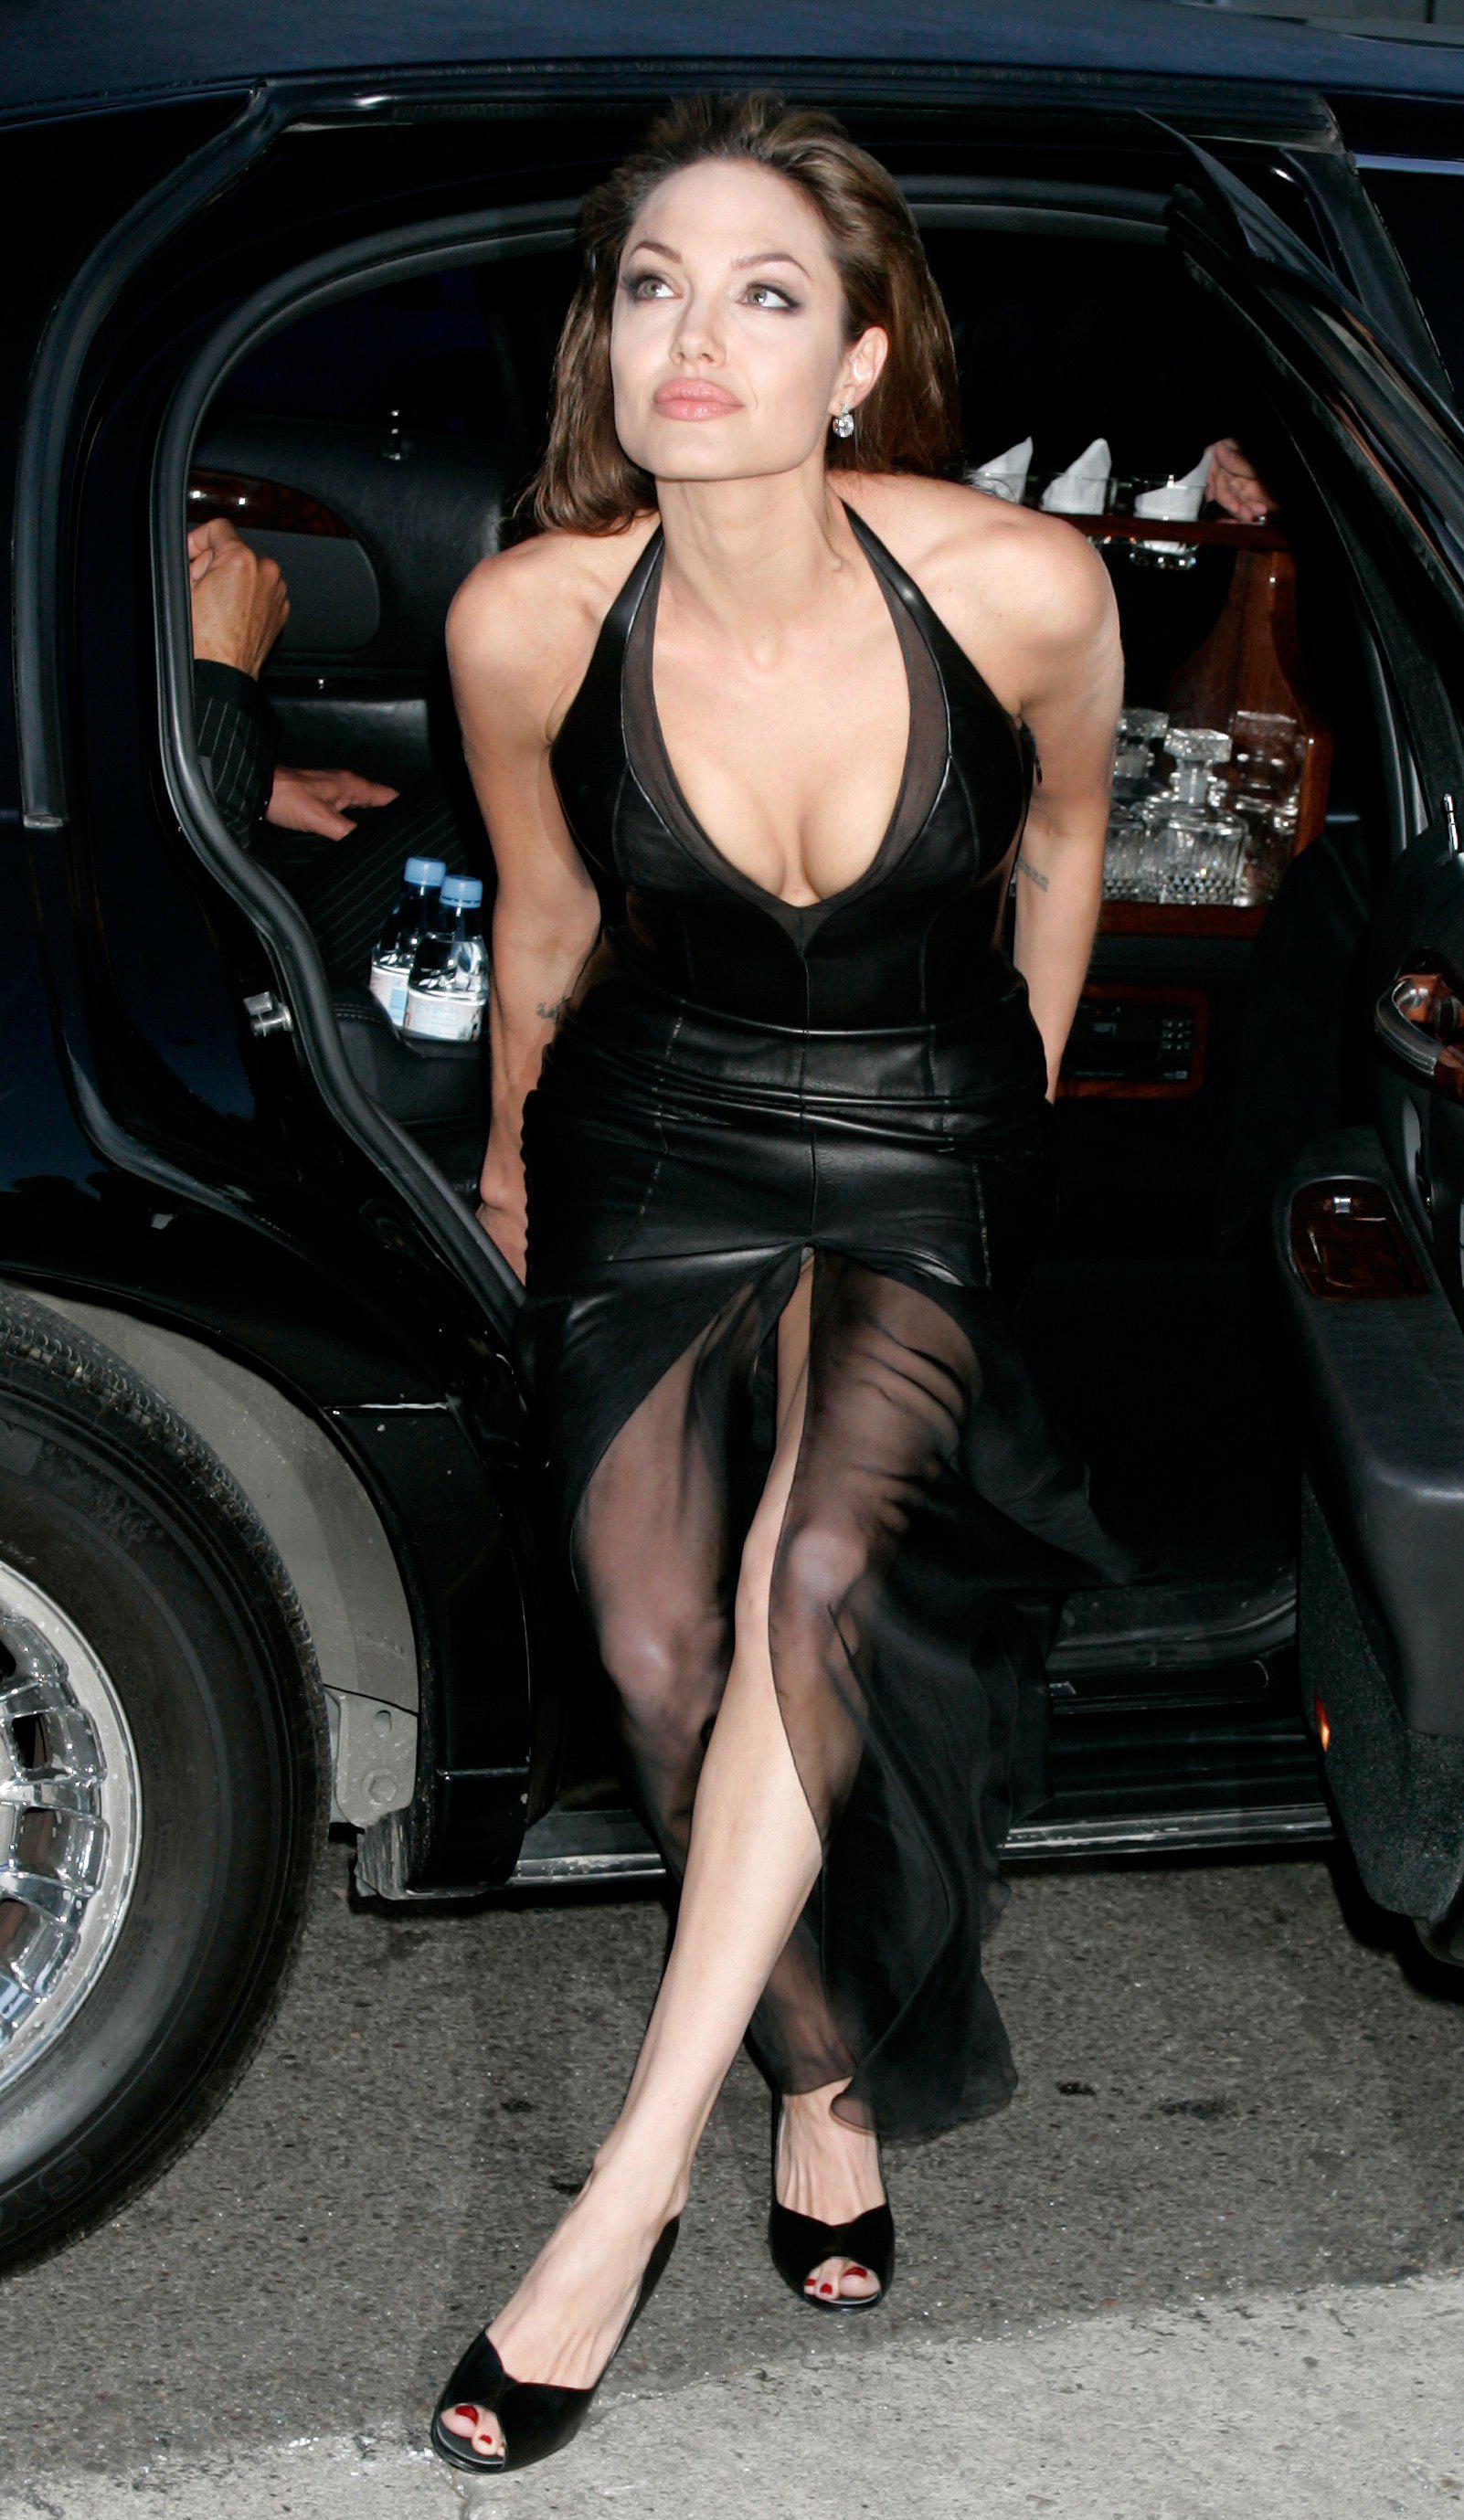 Angelina jolie desnuda videos gratis nude picture 89